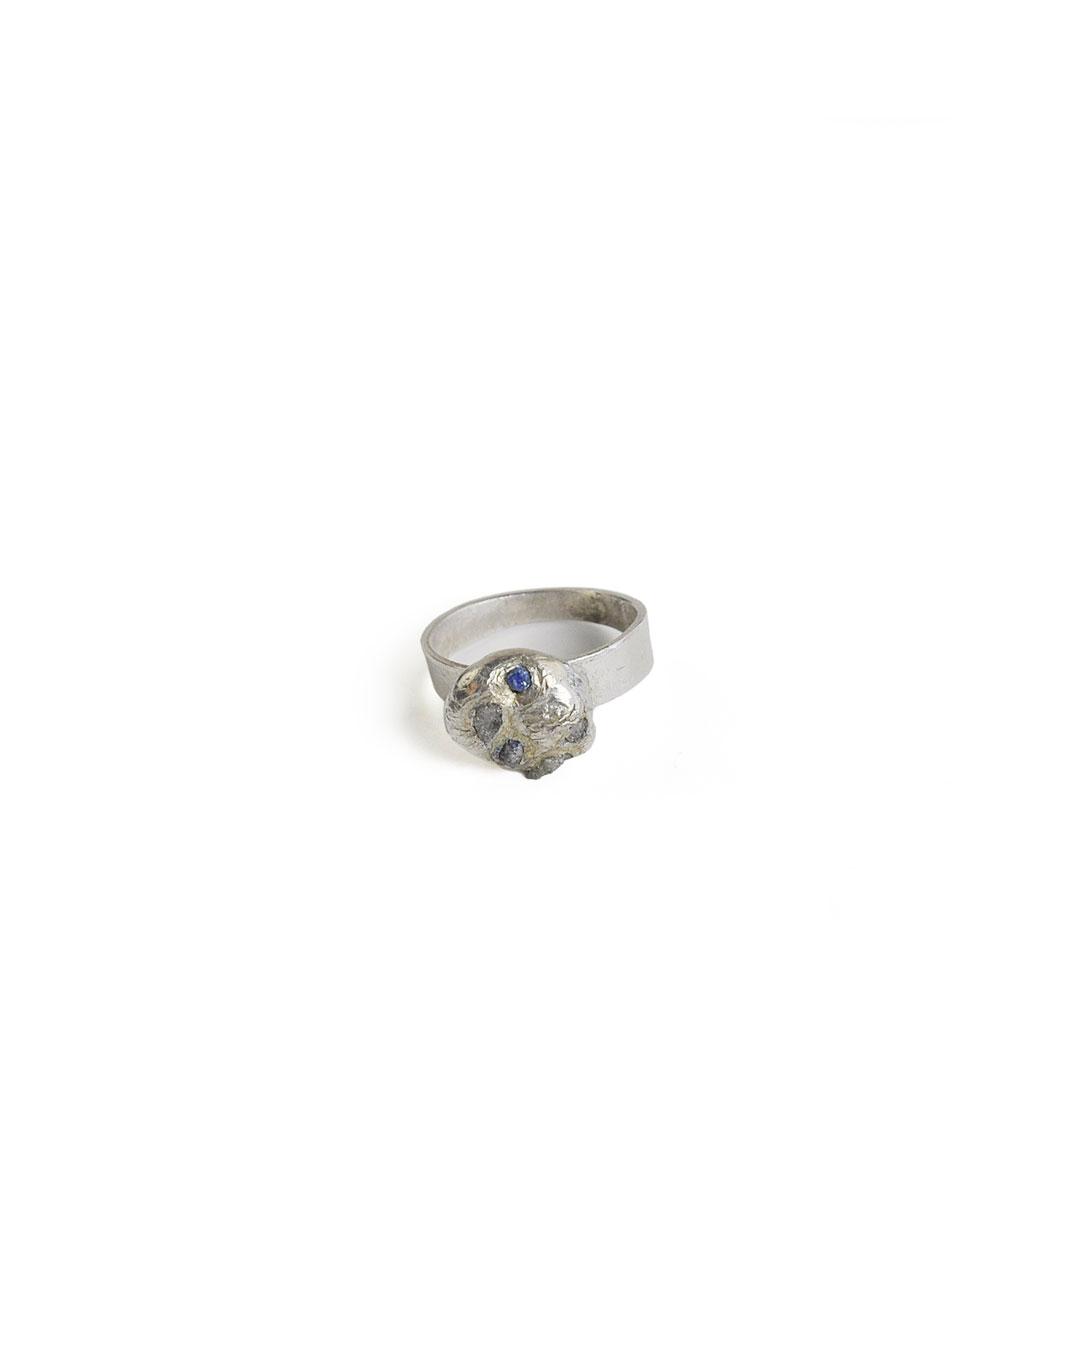 Rudolf Kocéa, untitled, 2014, ring; silver, copper, uncut diamonds, 25 x 10 mm, €730